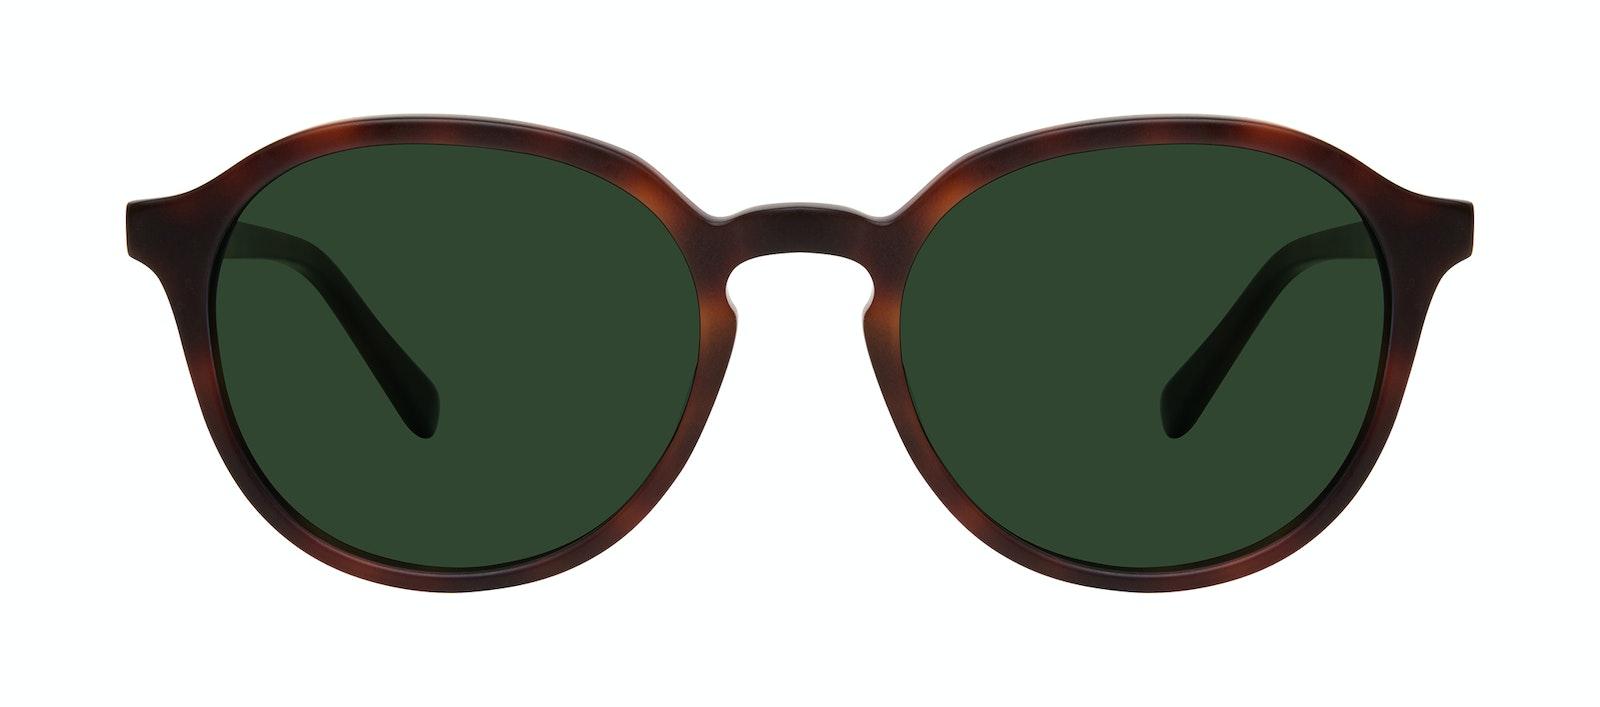 Affordable Fashion Glasses Round Sunglasses Men Ansel Matte Tortoise Front